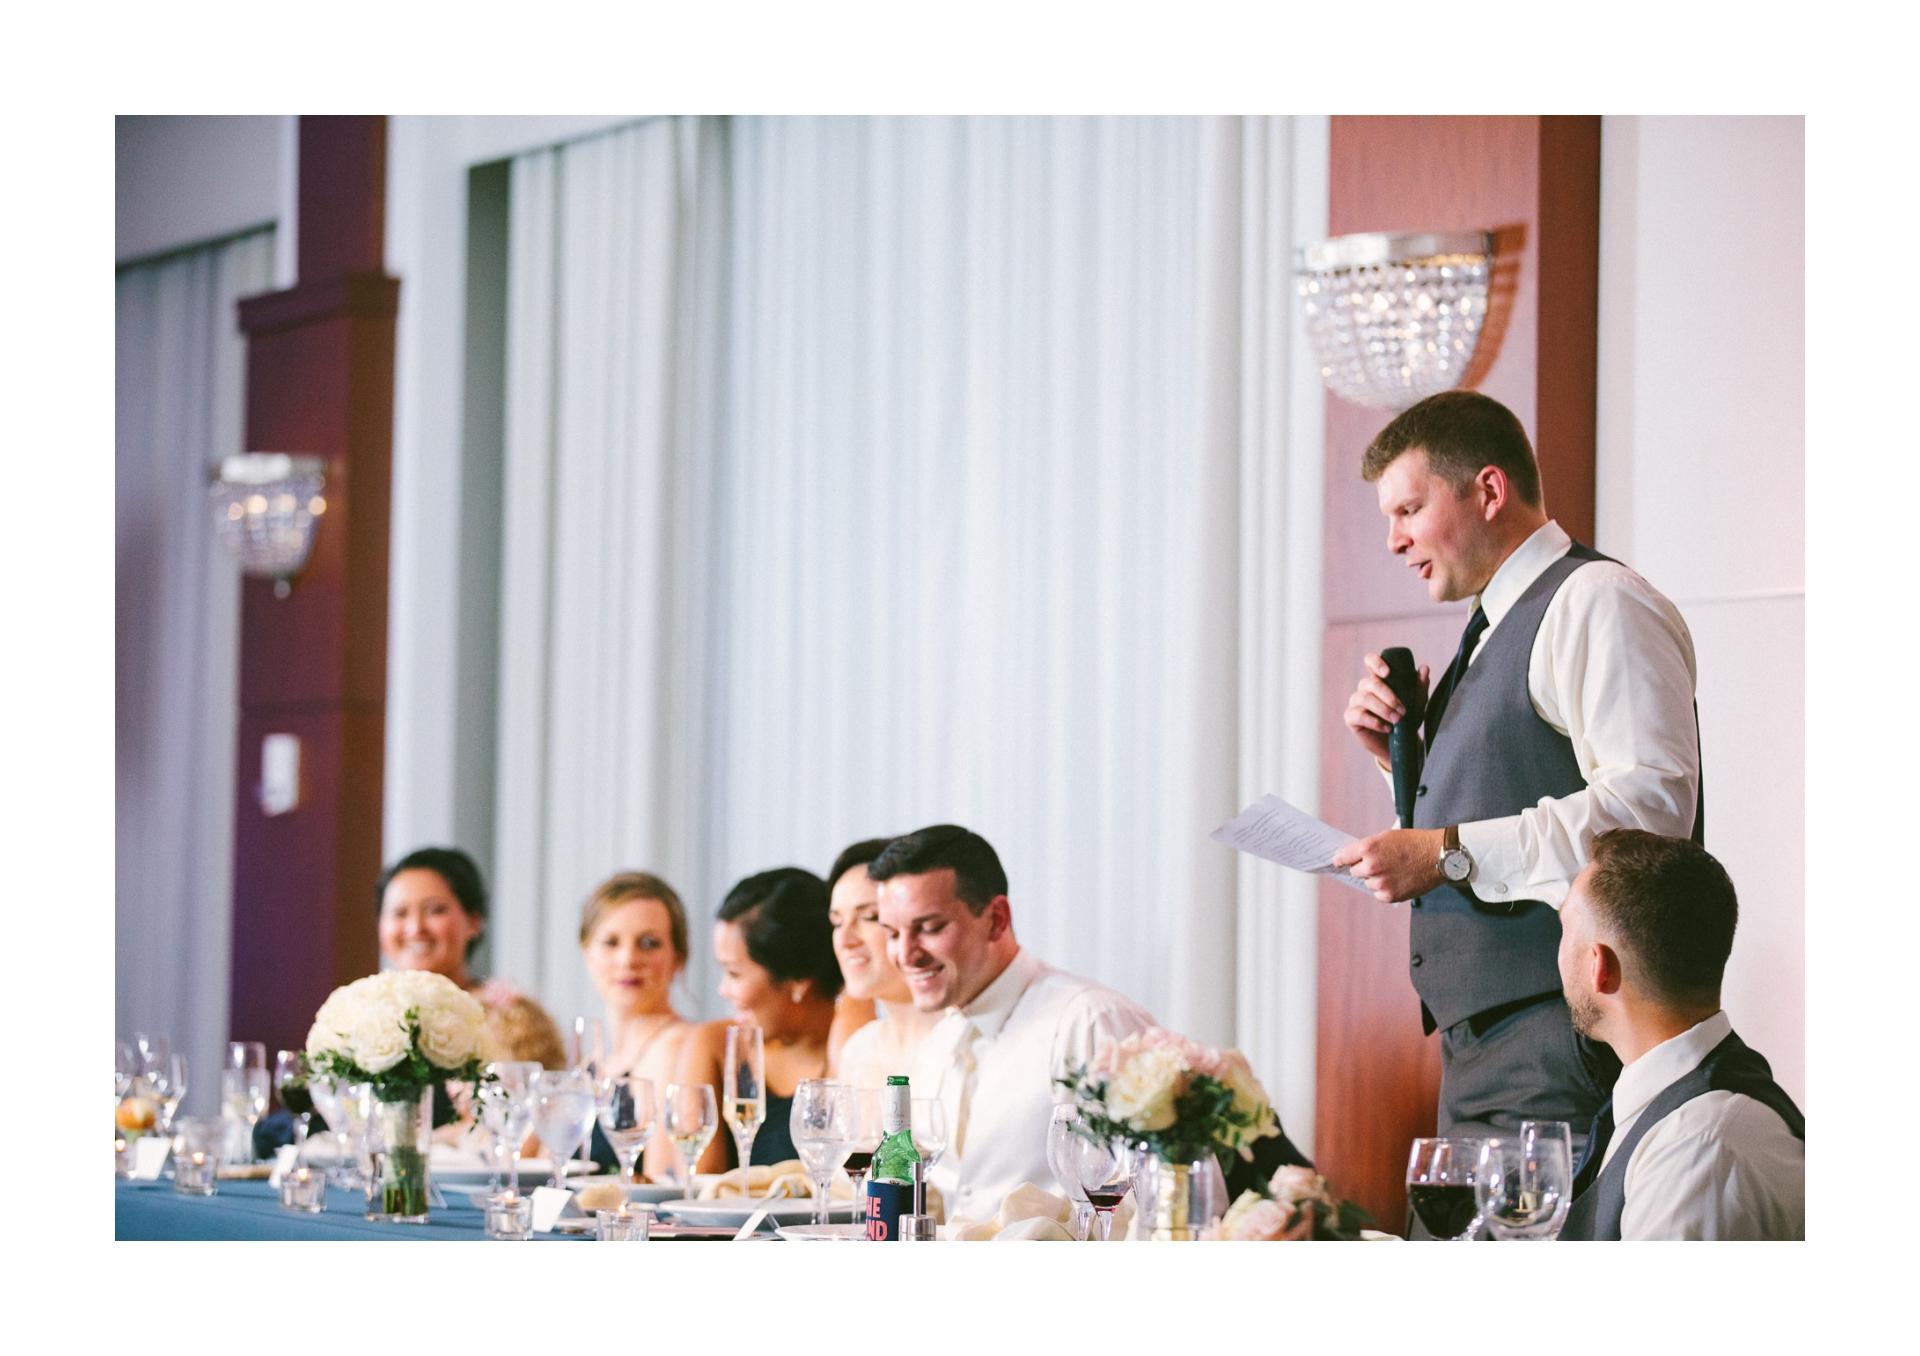 Intercontinental Hotel Wedding in Cleveland 2 37.jpg